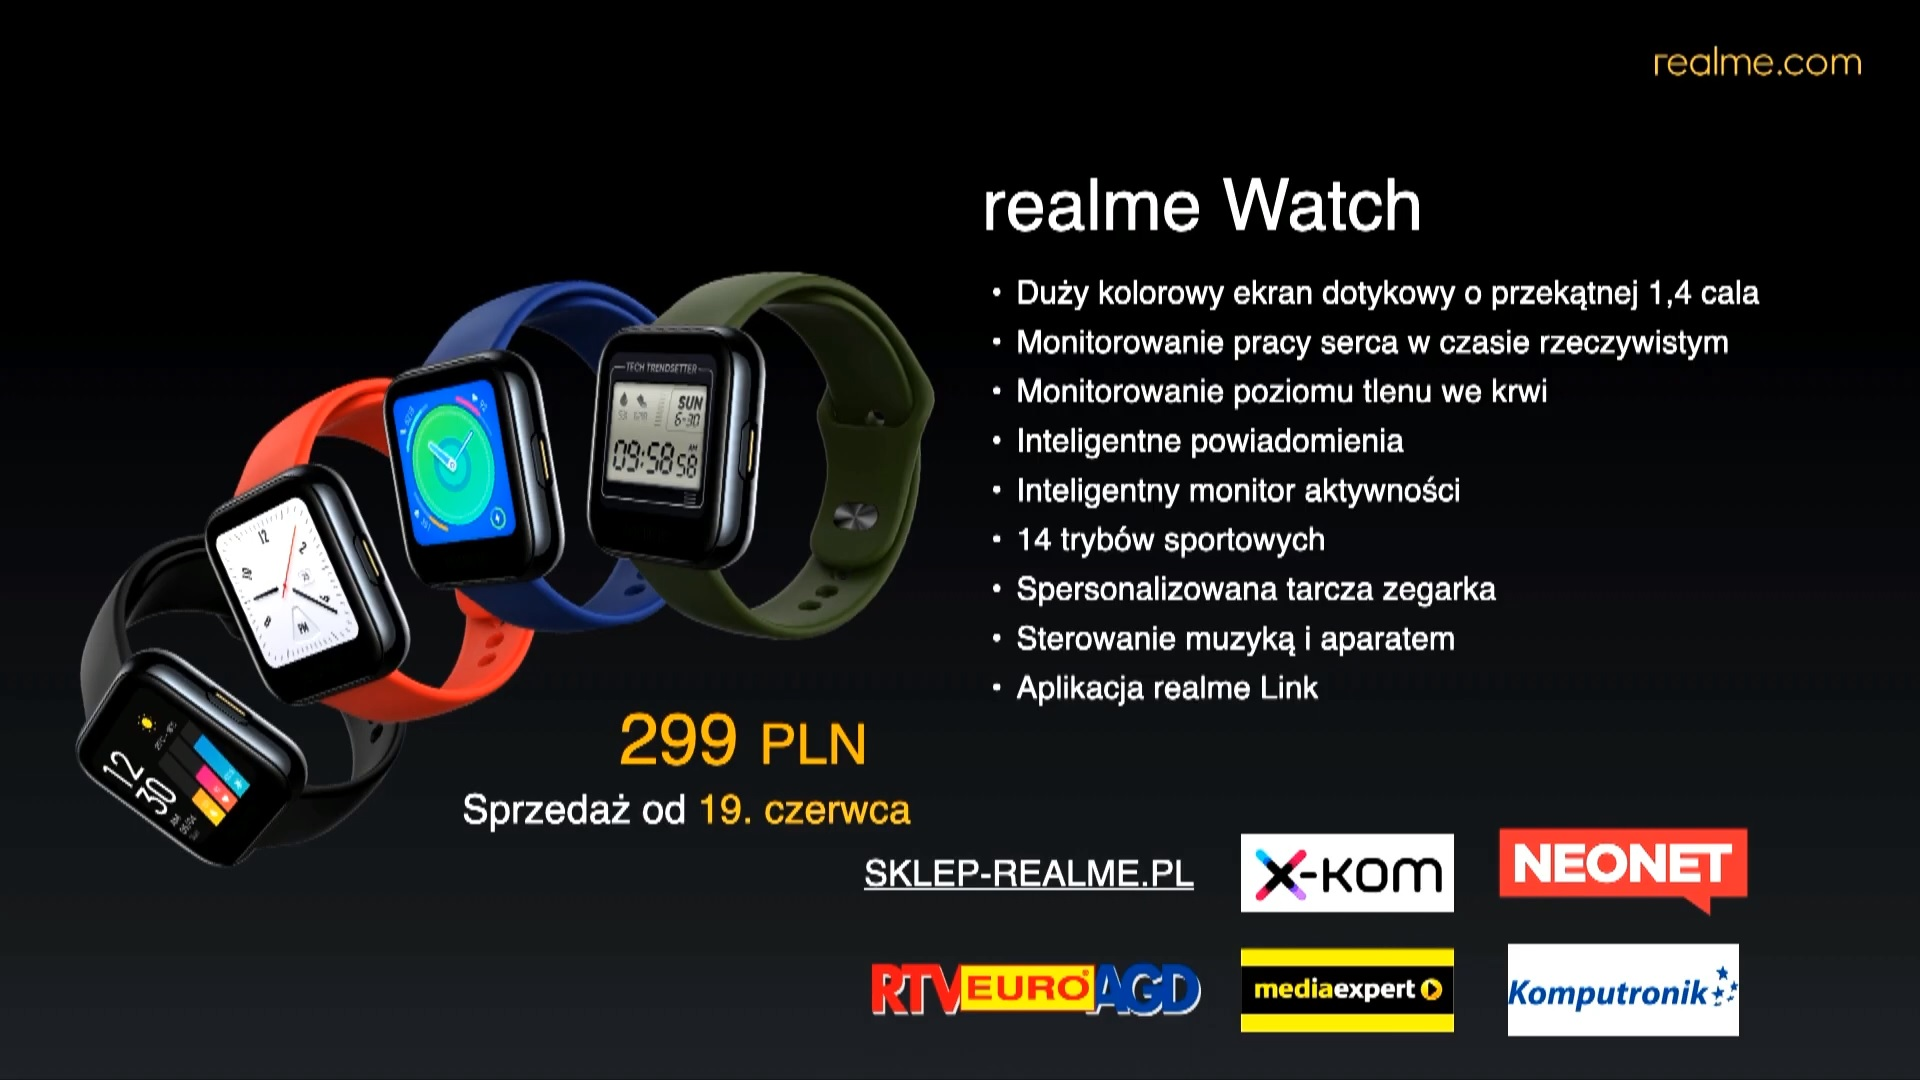 realme Watch price Poland